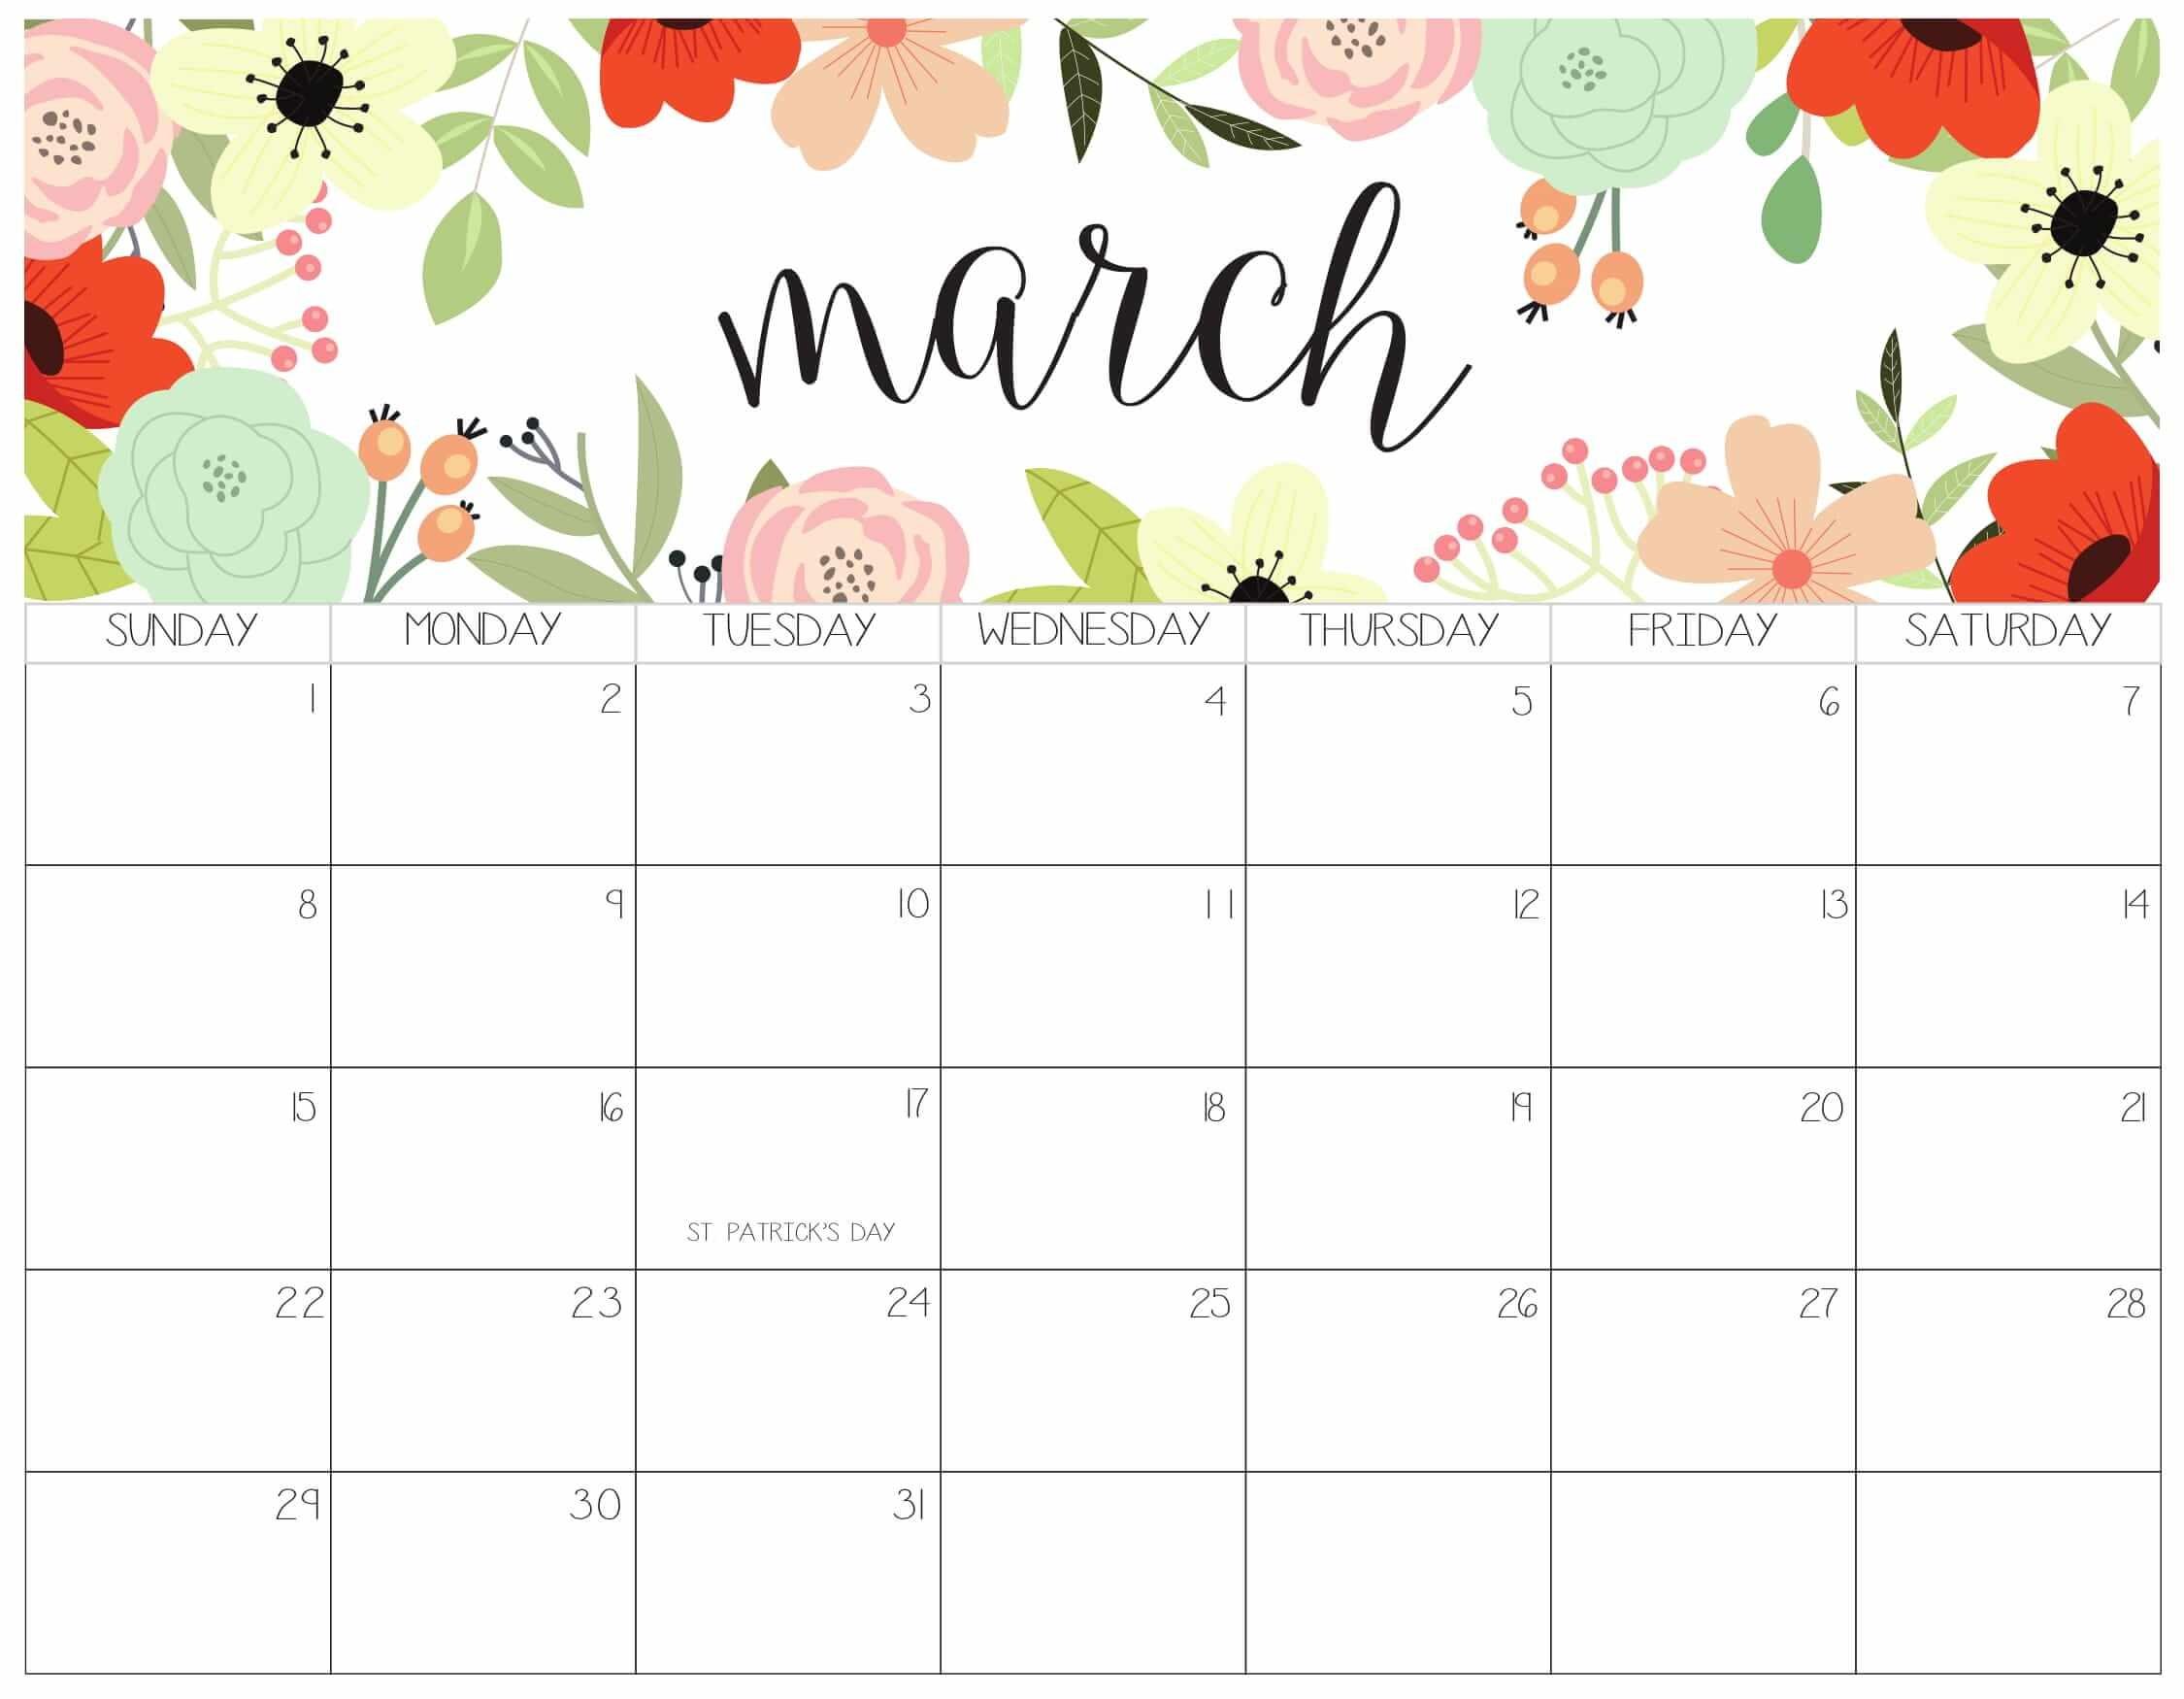 12 month calendar template 2019  Printable March Calendar 2020 Templates - 2019 Calendars ..